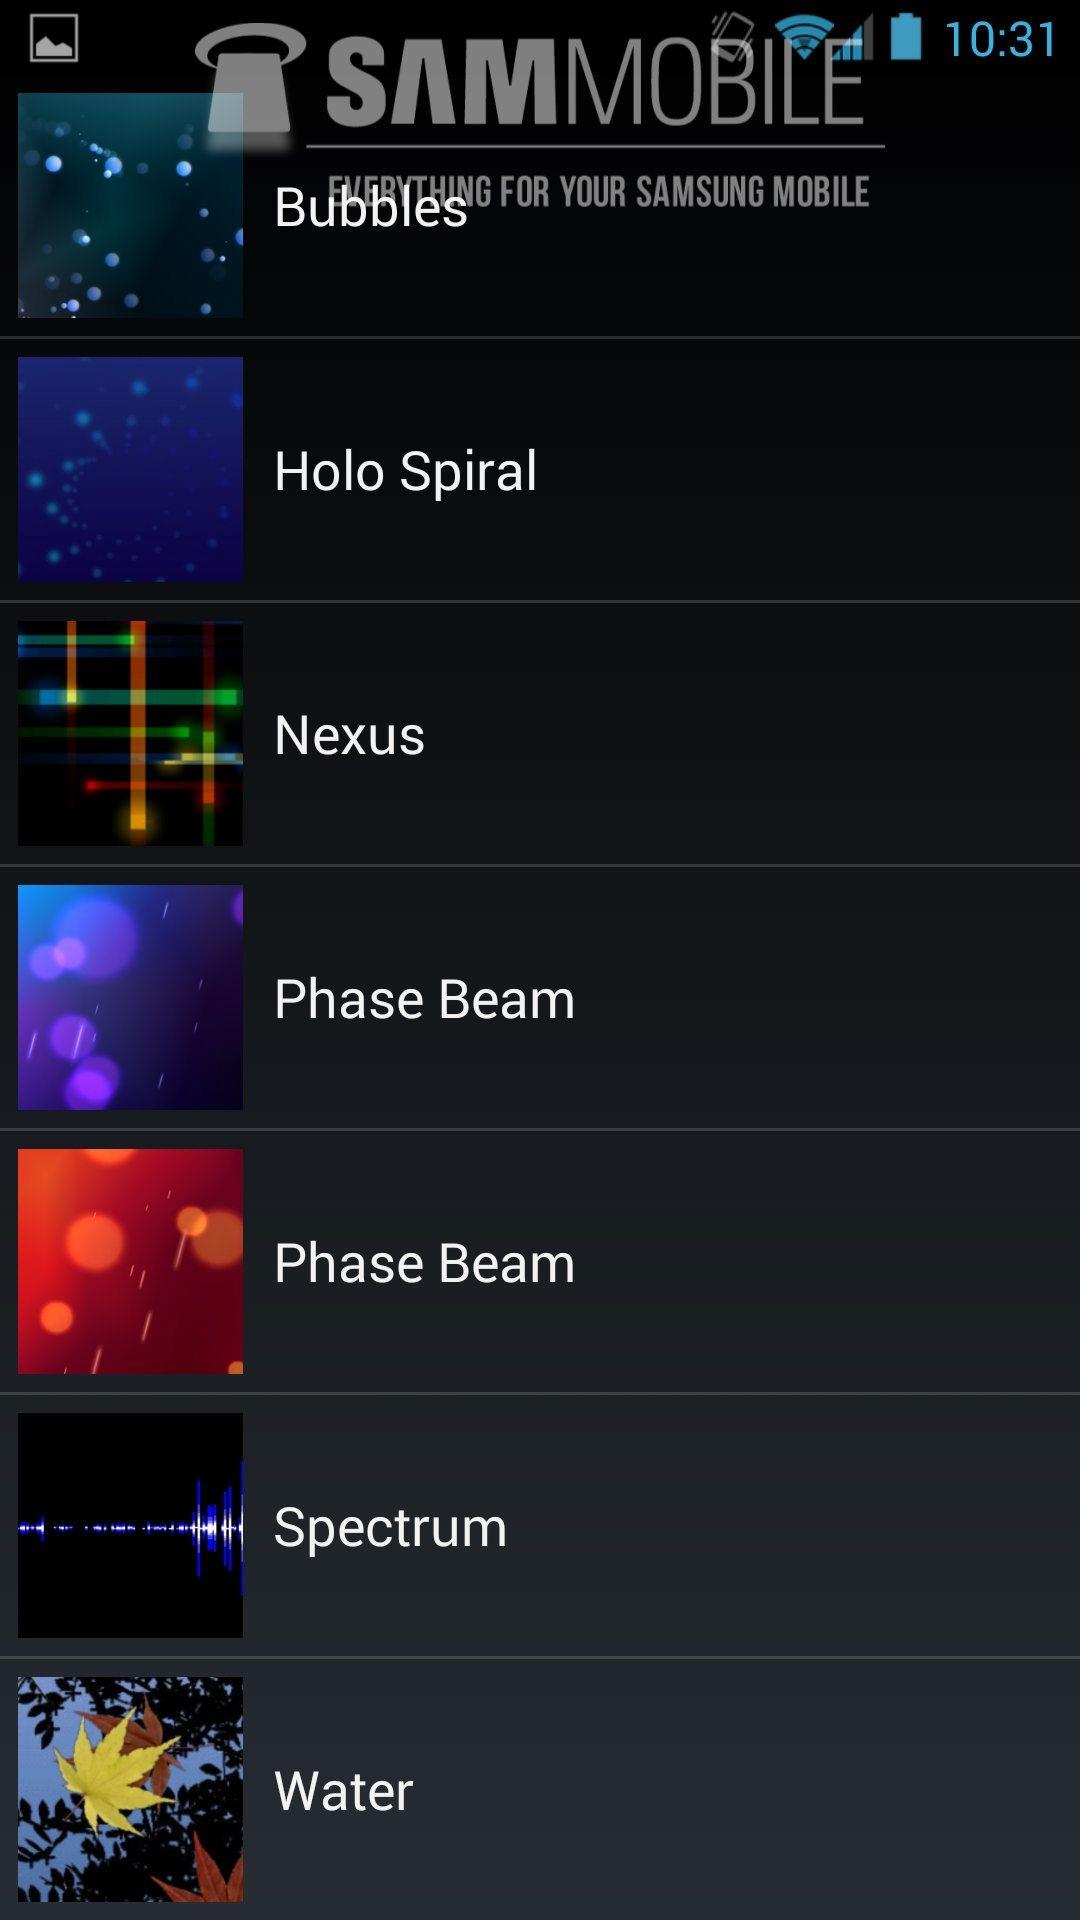 screenshot 2013 06 28 10 31 401